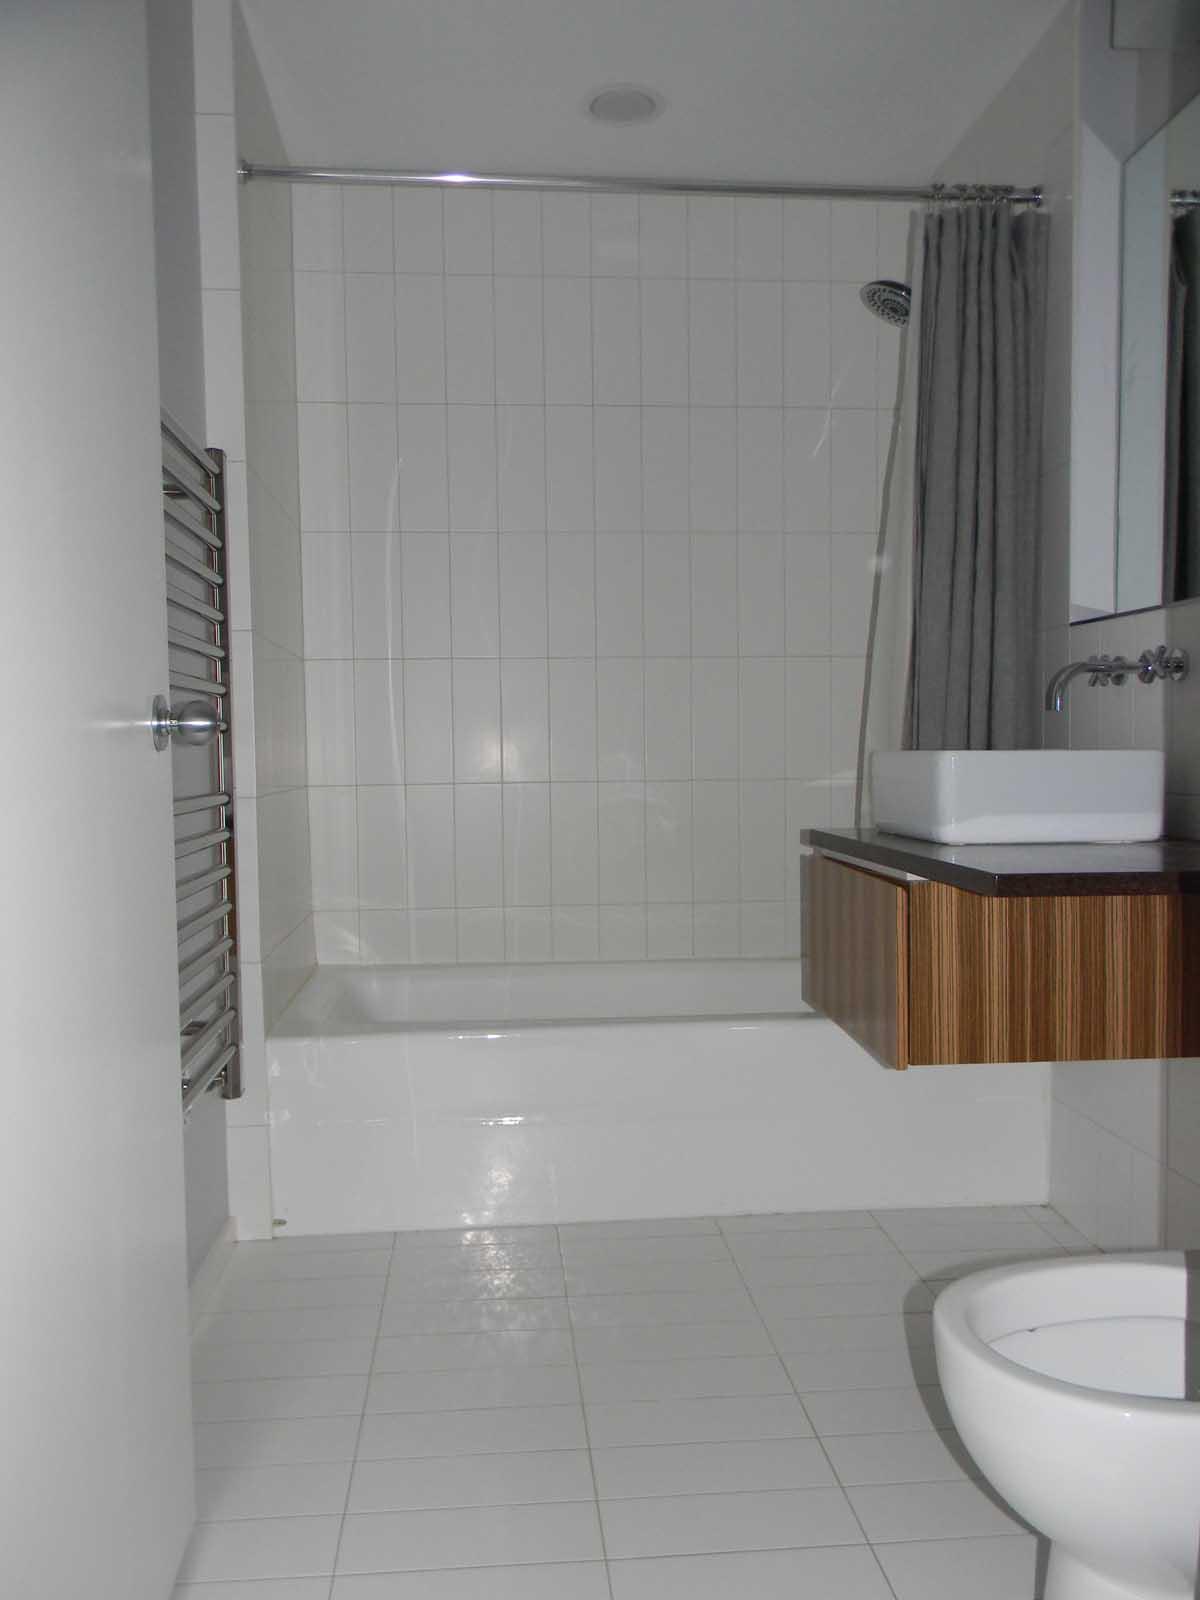 Dorchester Ave. Boston - Before Bathroom Remodel